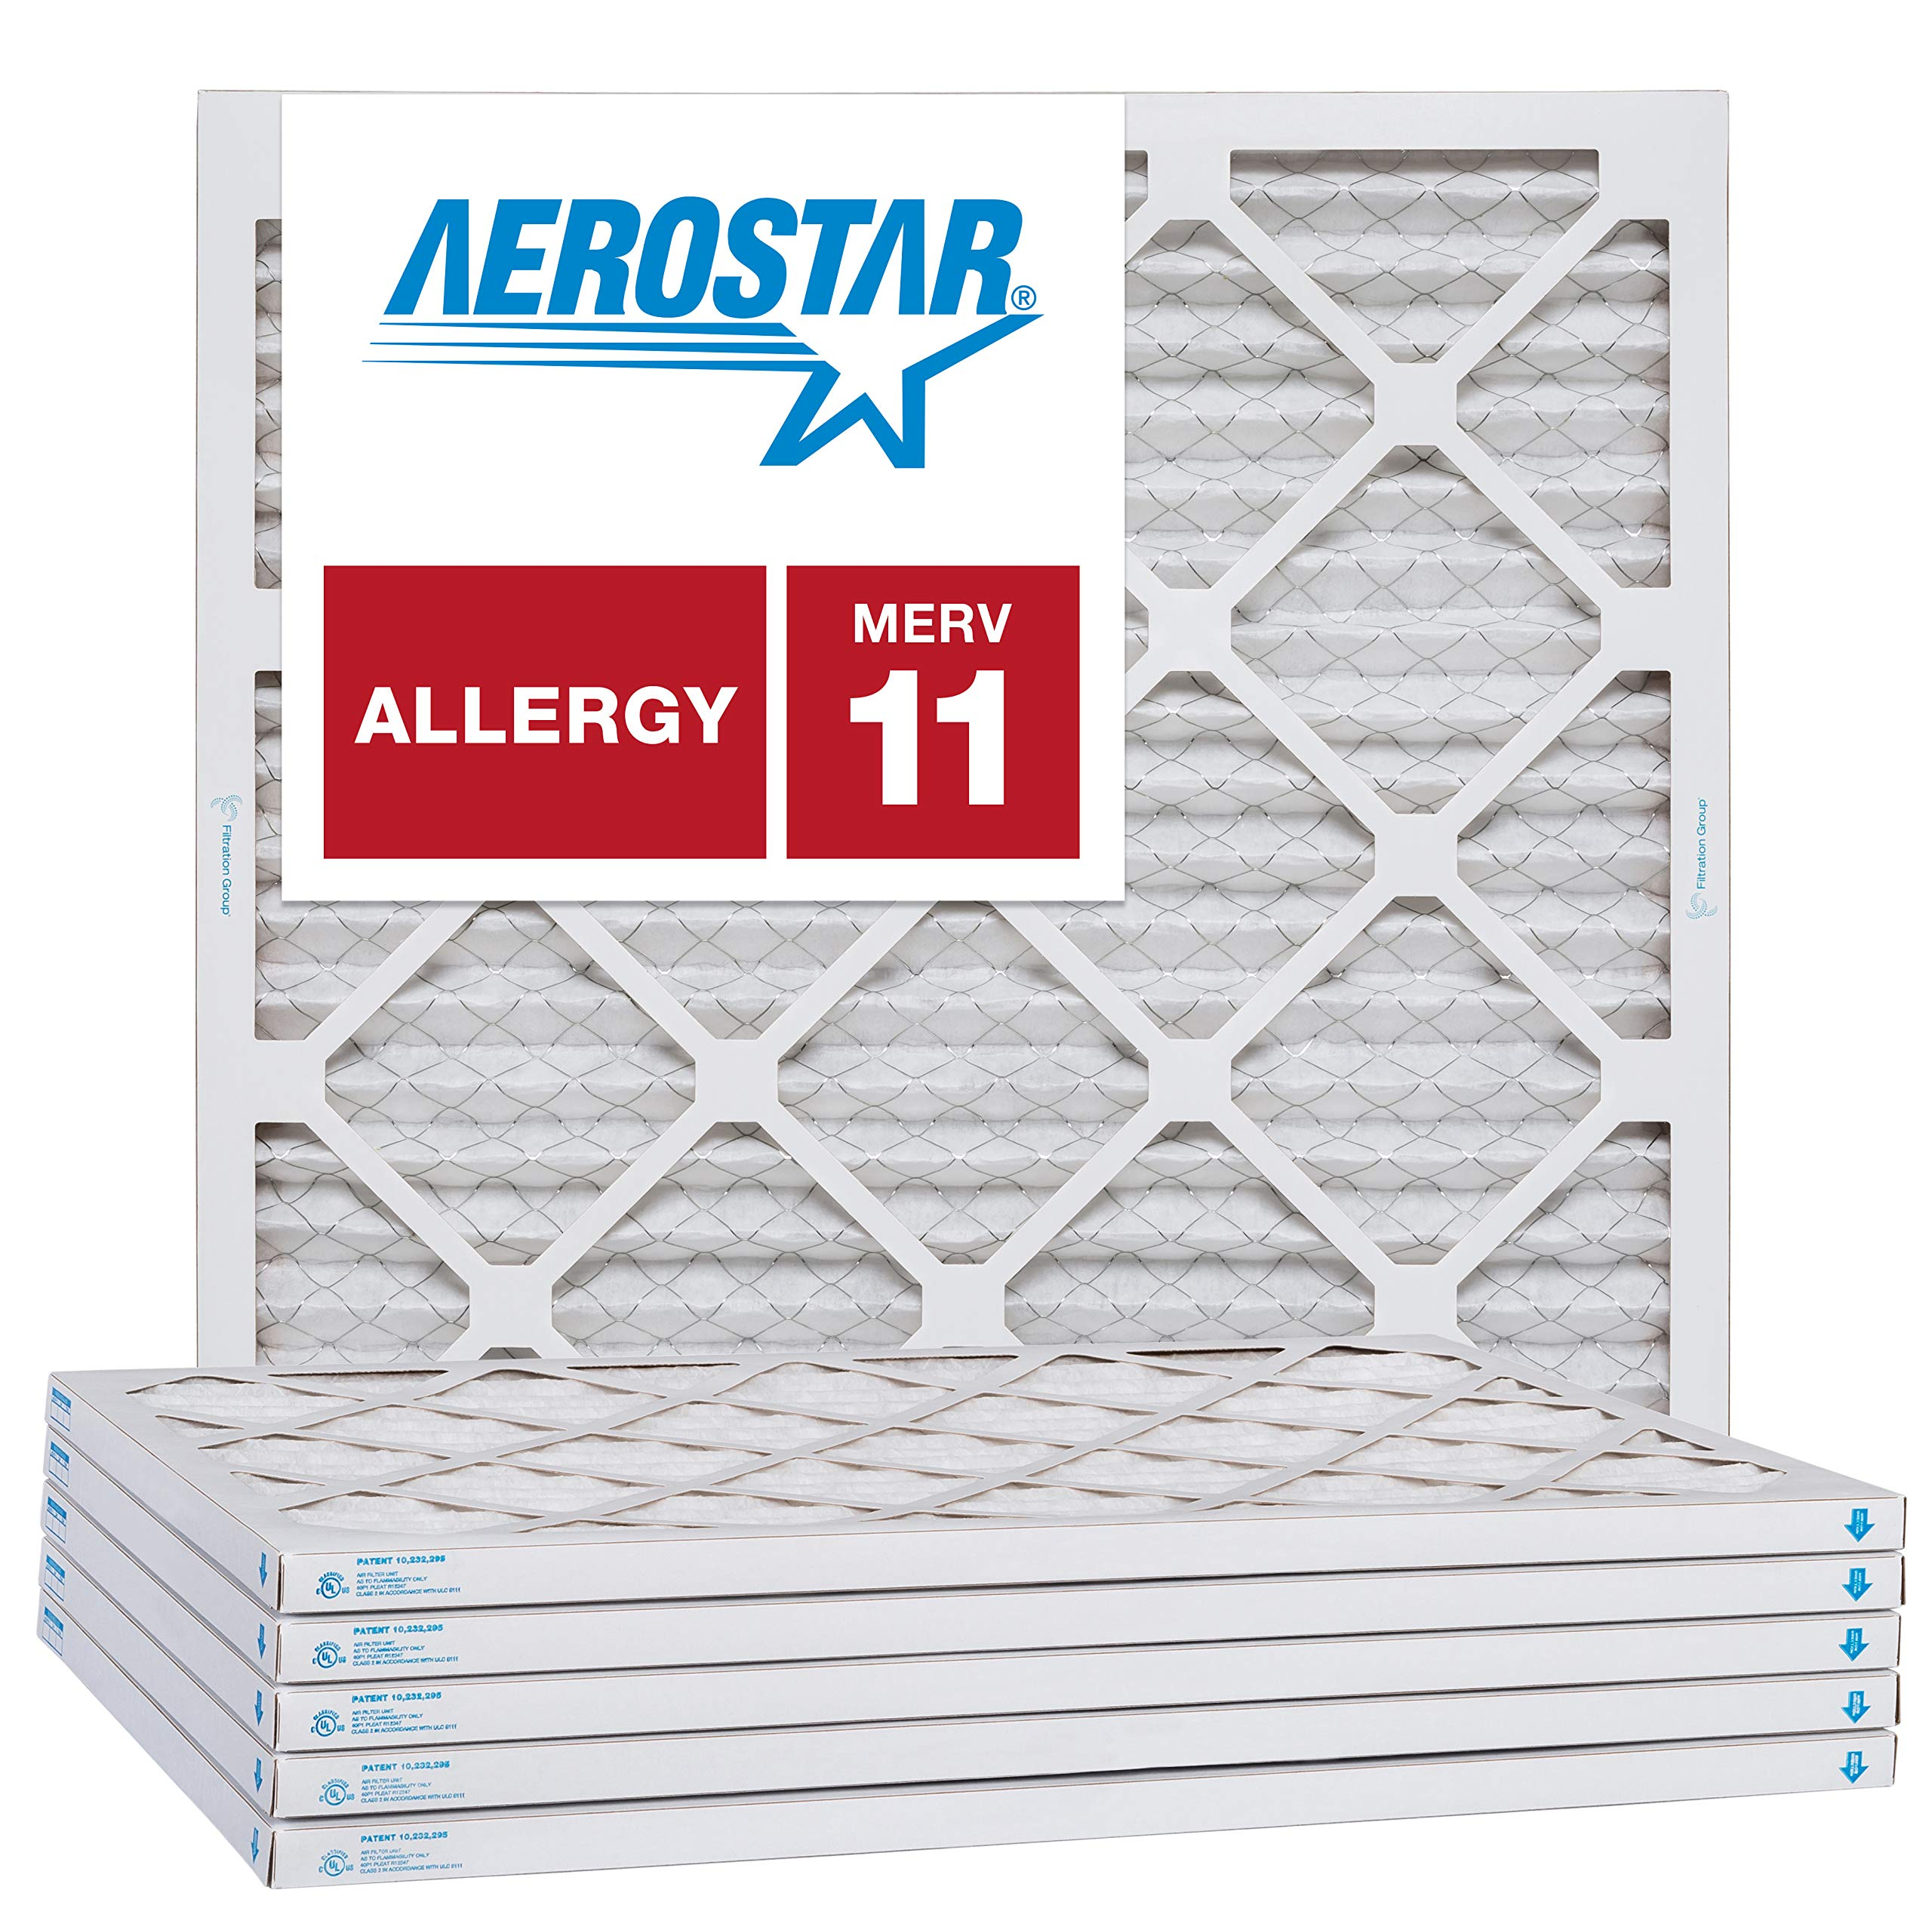 Aerostar 21 1/4x21 1/4x1 MERV 11, Pleated Air Filter, 21 1/4 x 21 1/4 x 1, Box of 6, Made in The USA